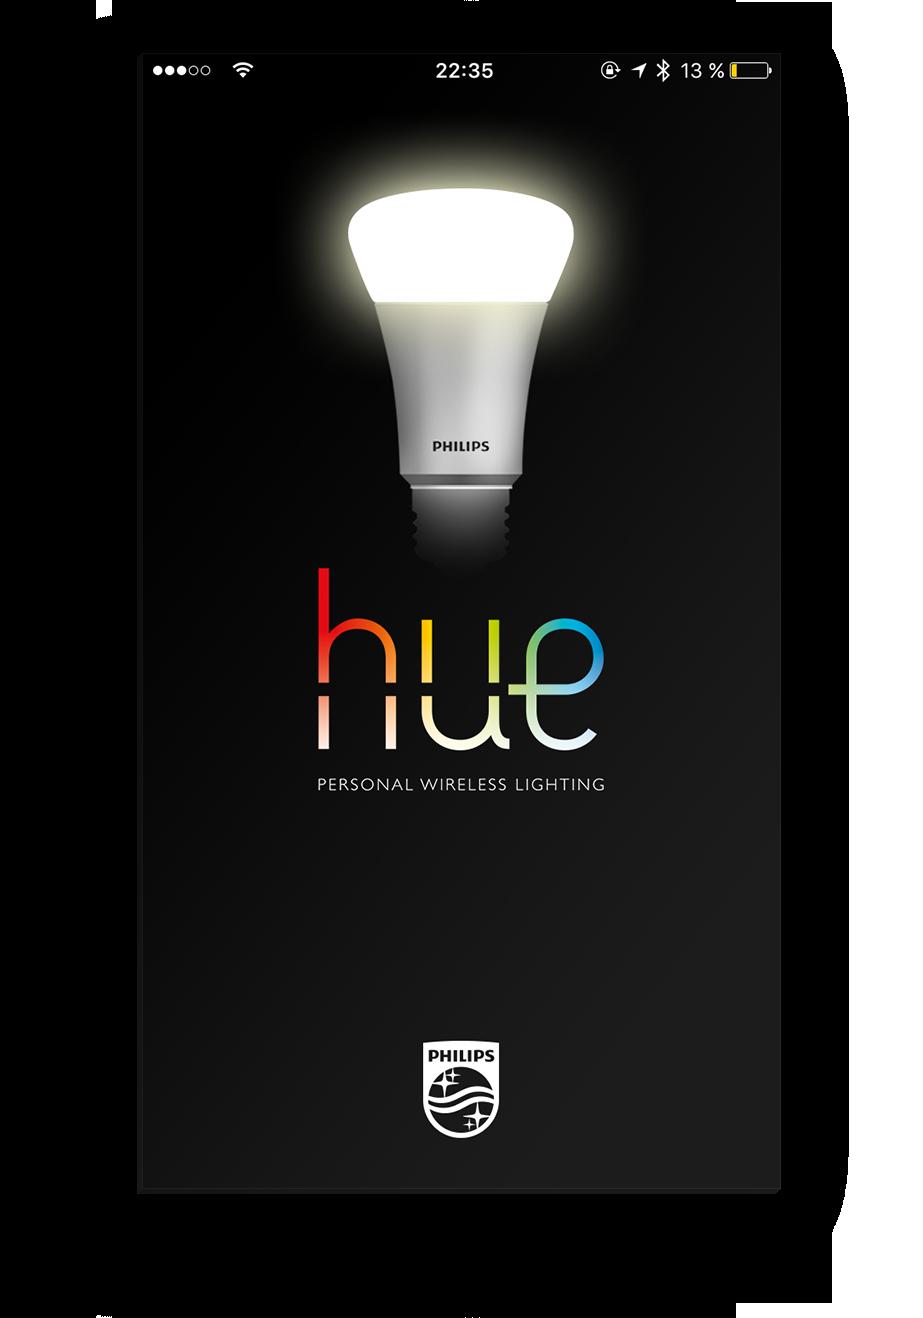 app-screen-empfehlung-hue